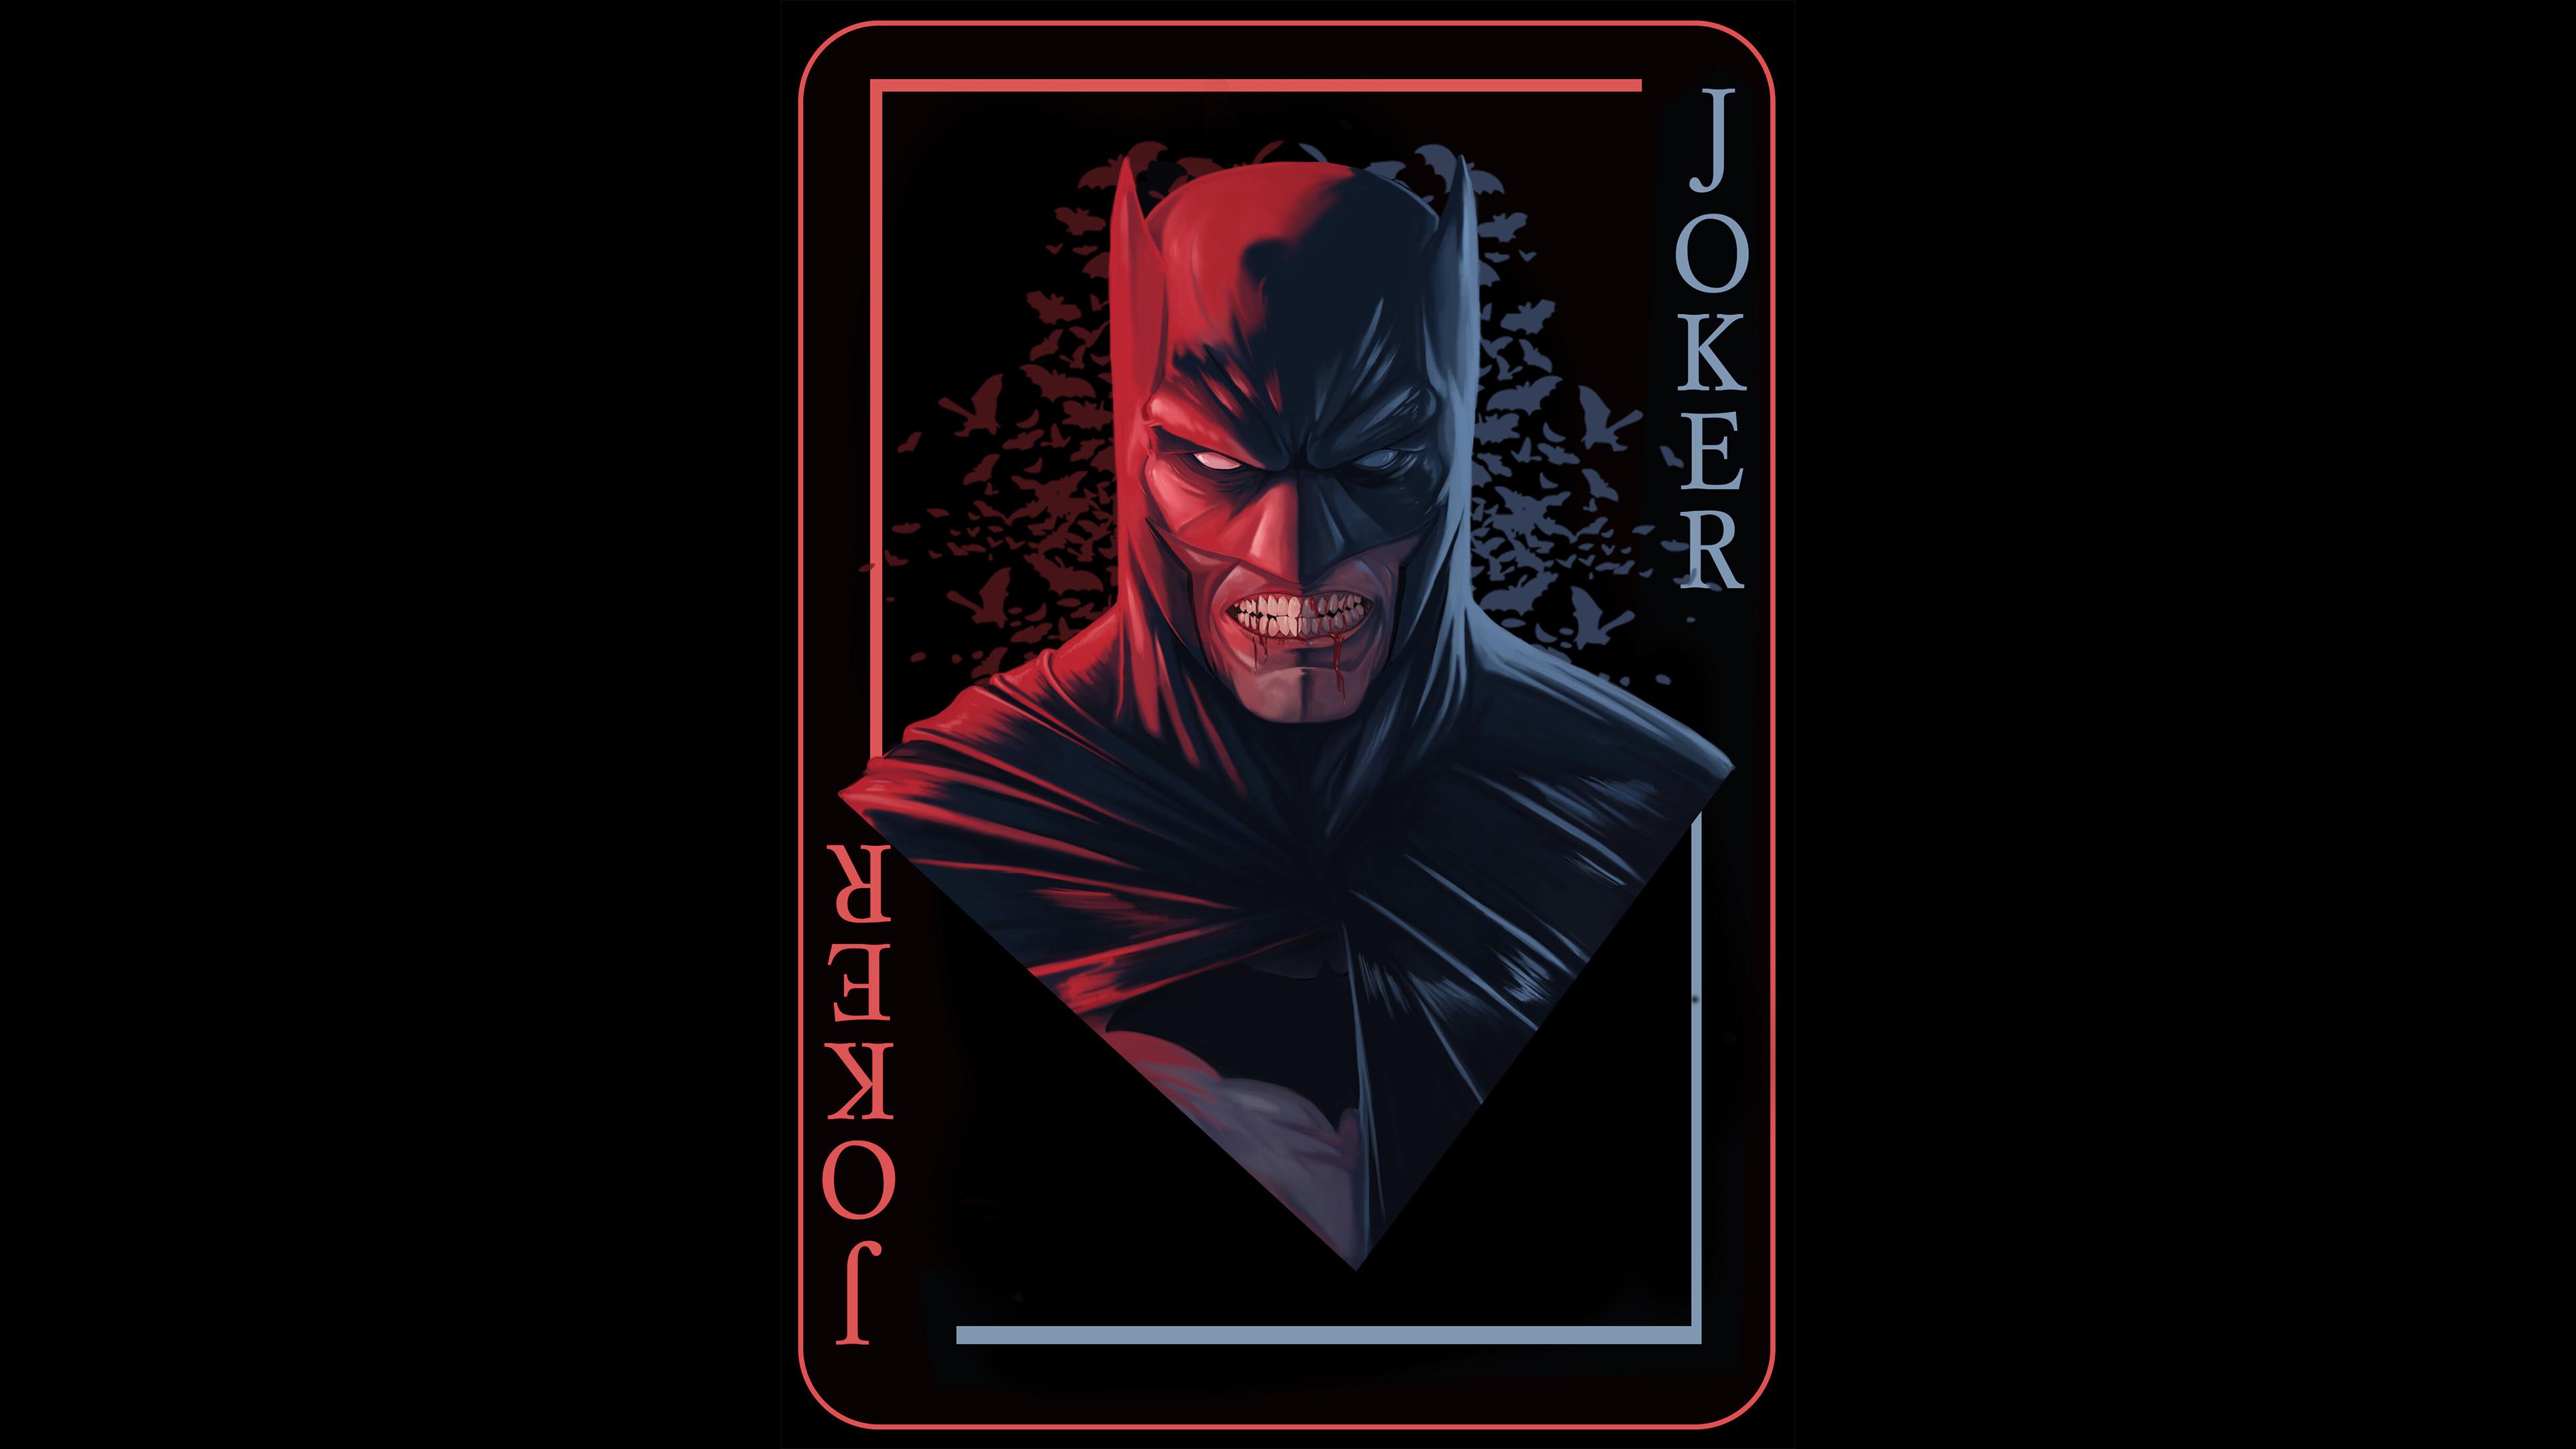 batman injured 1562105901 - Batman Injured - superheroes wallpapers, hd-wallpapers, digital art wallpapers, batman wallpapers, artwork wallpapers, 4k-wallpapers